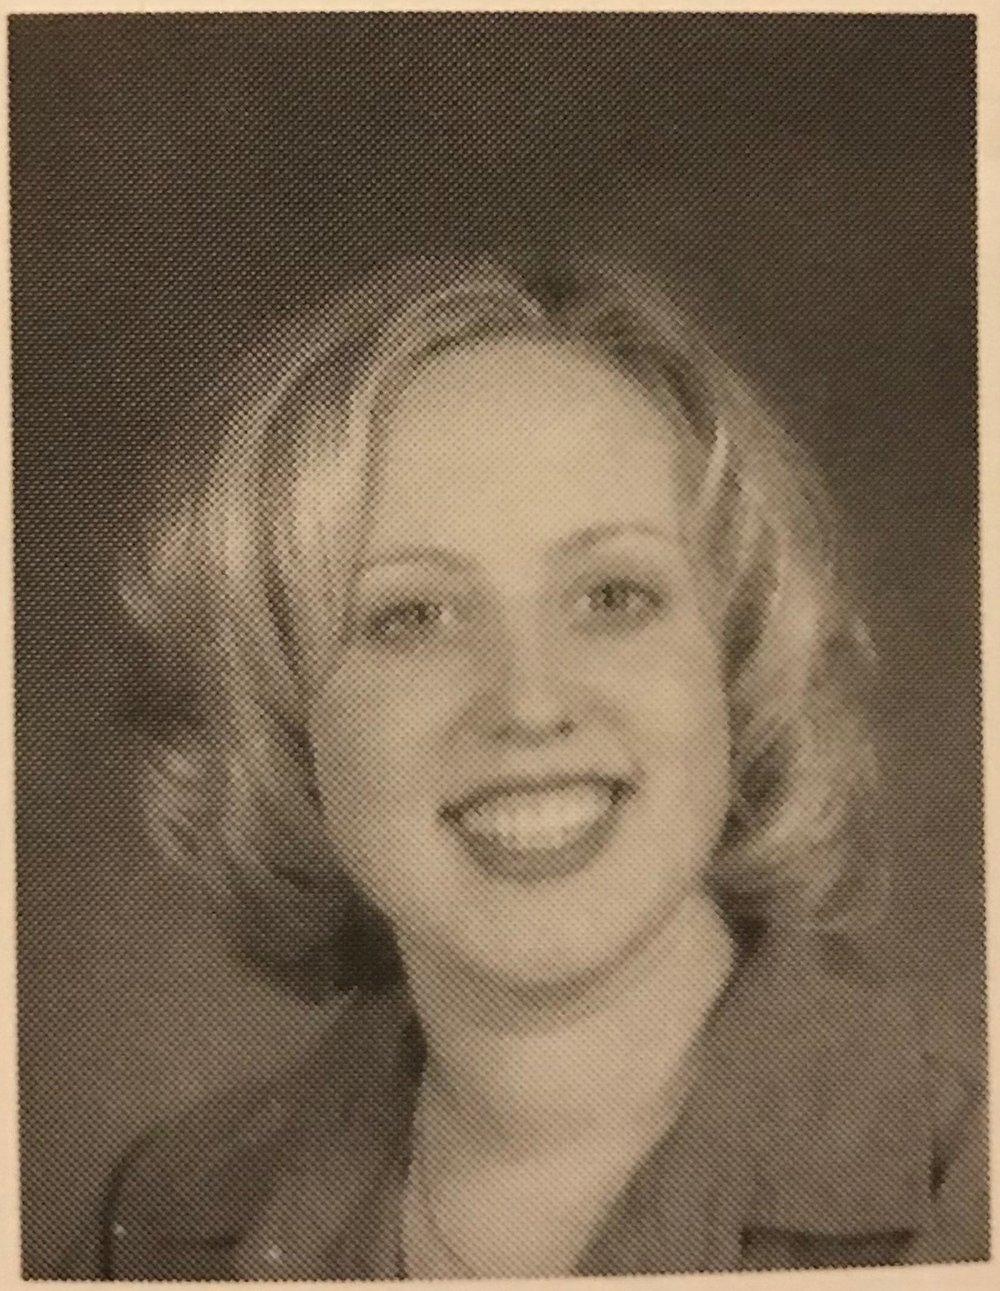 Laura Dingman, Choral Director